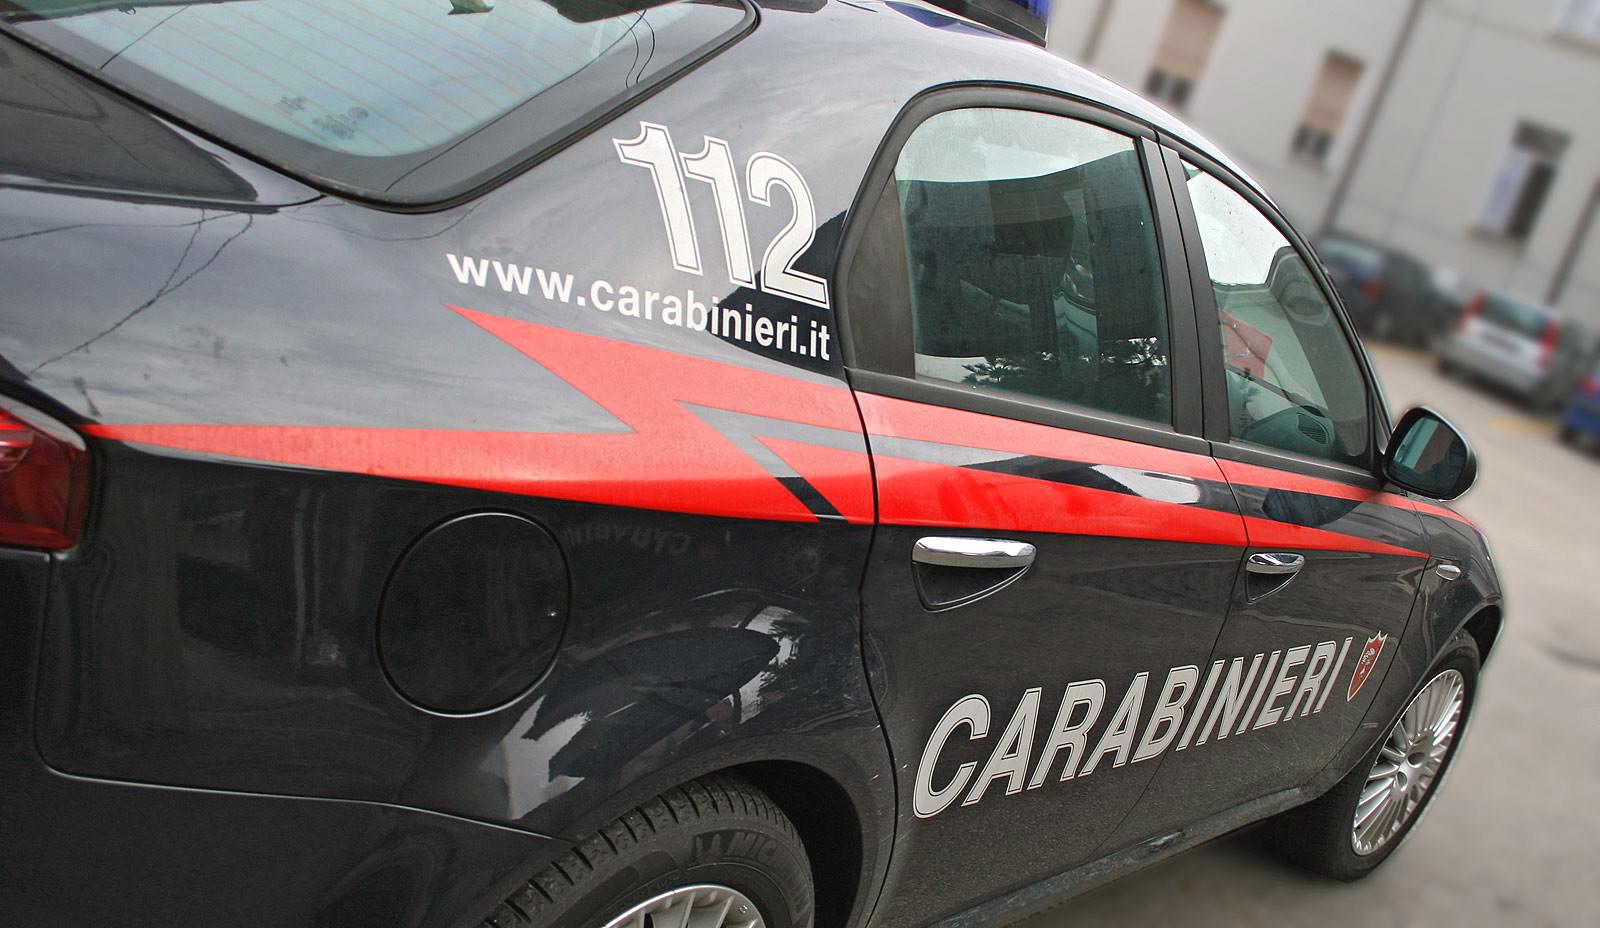 auto carabinieri ricatti folle